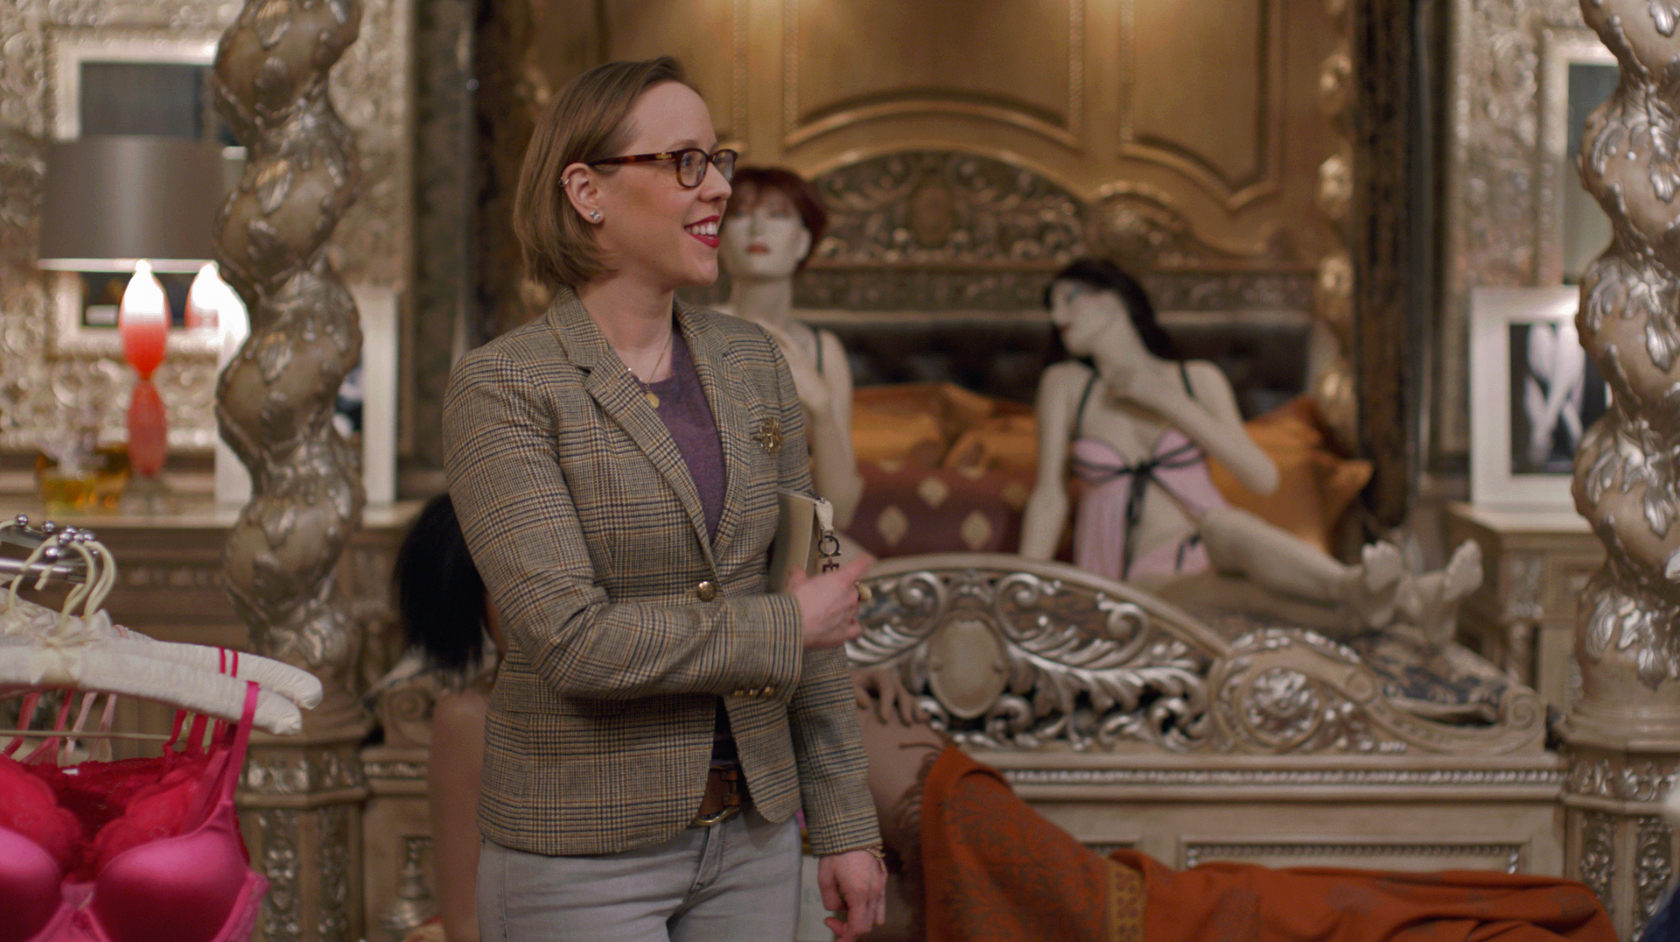 Sara Zofko On The Set Of Business Or Pleasure